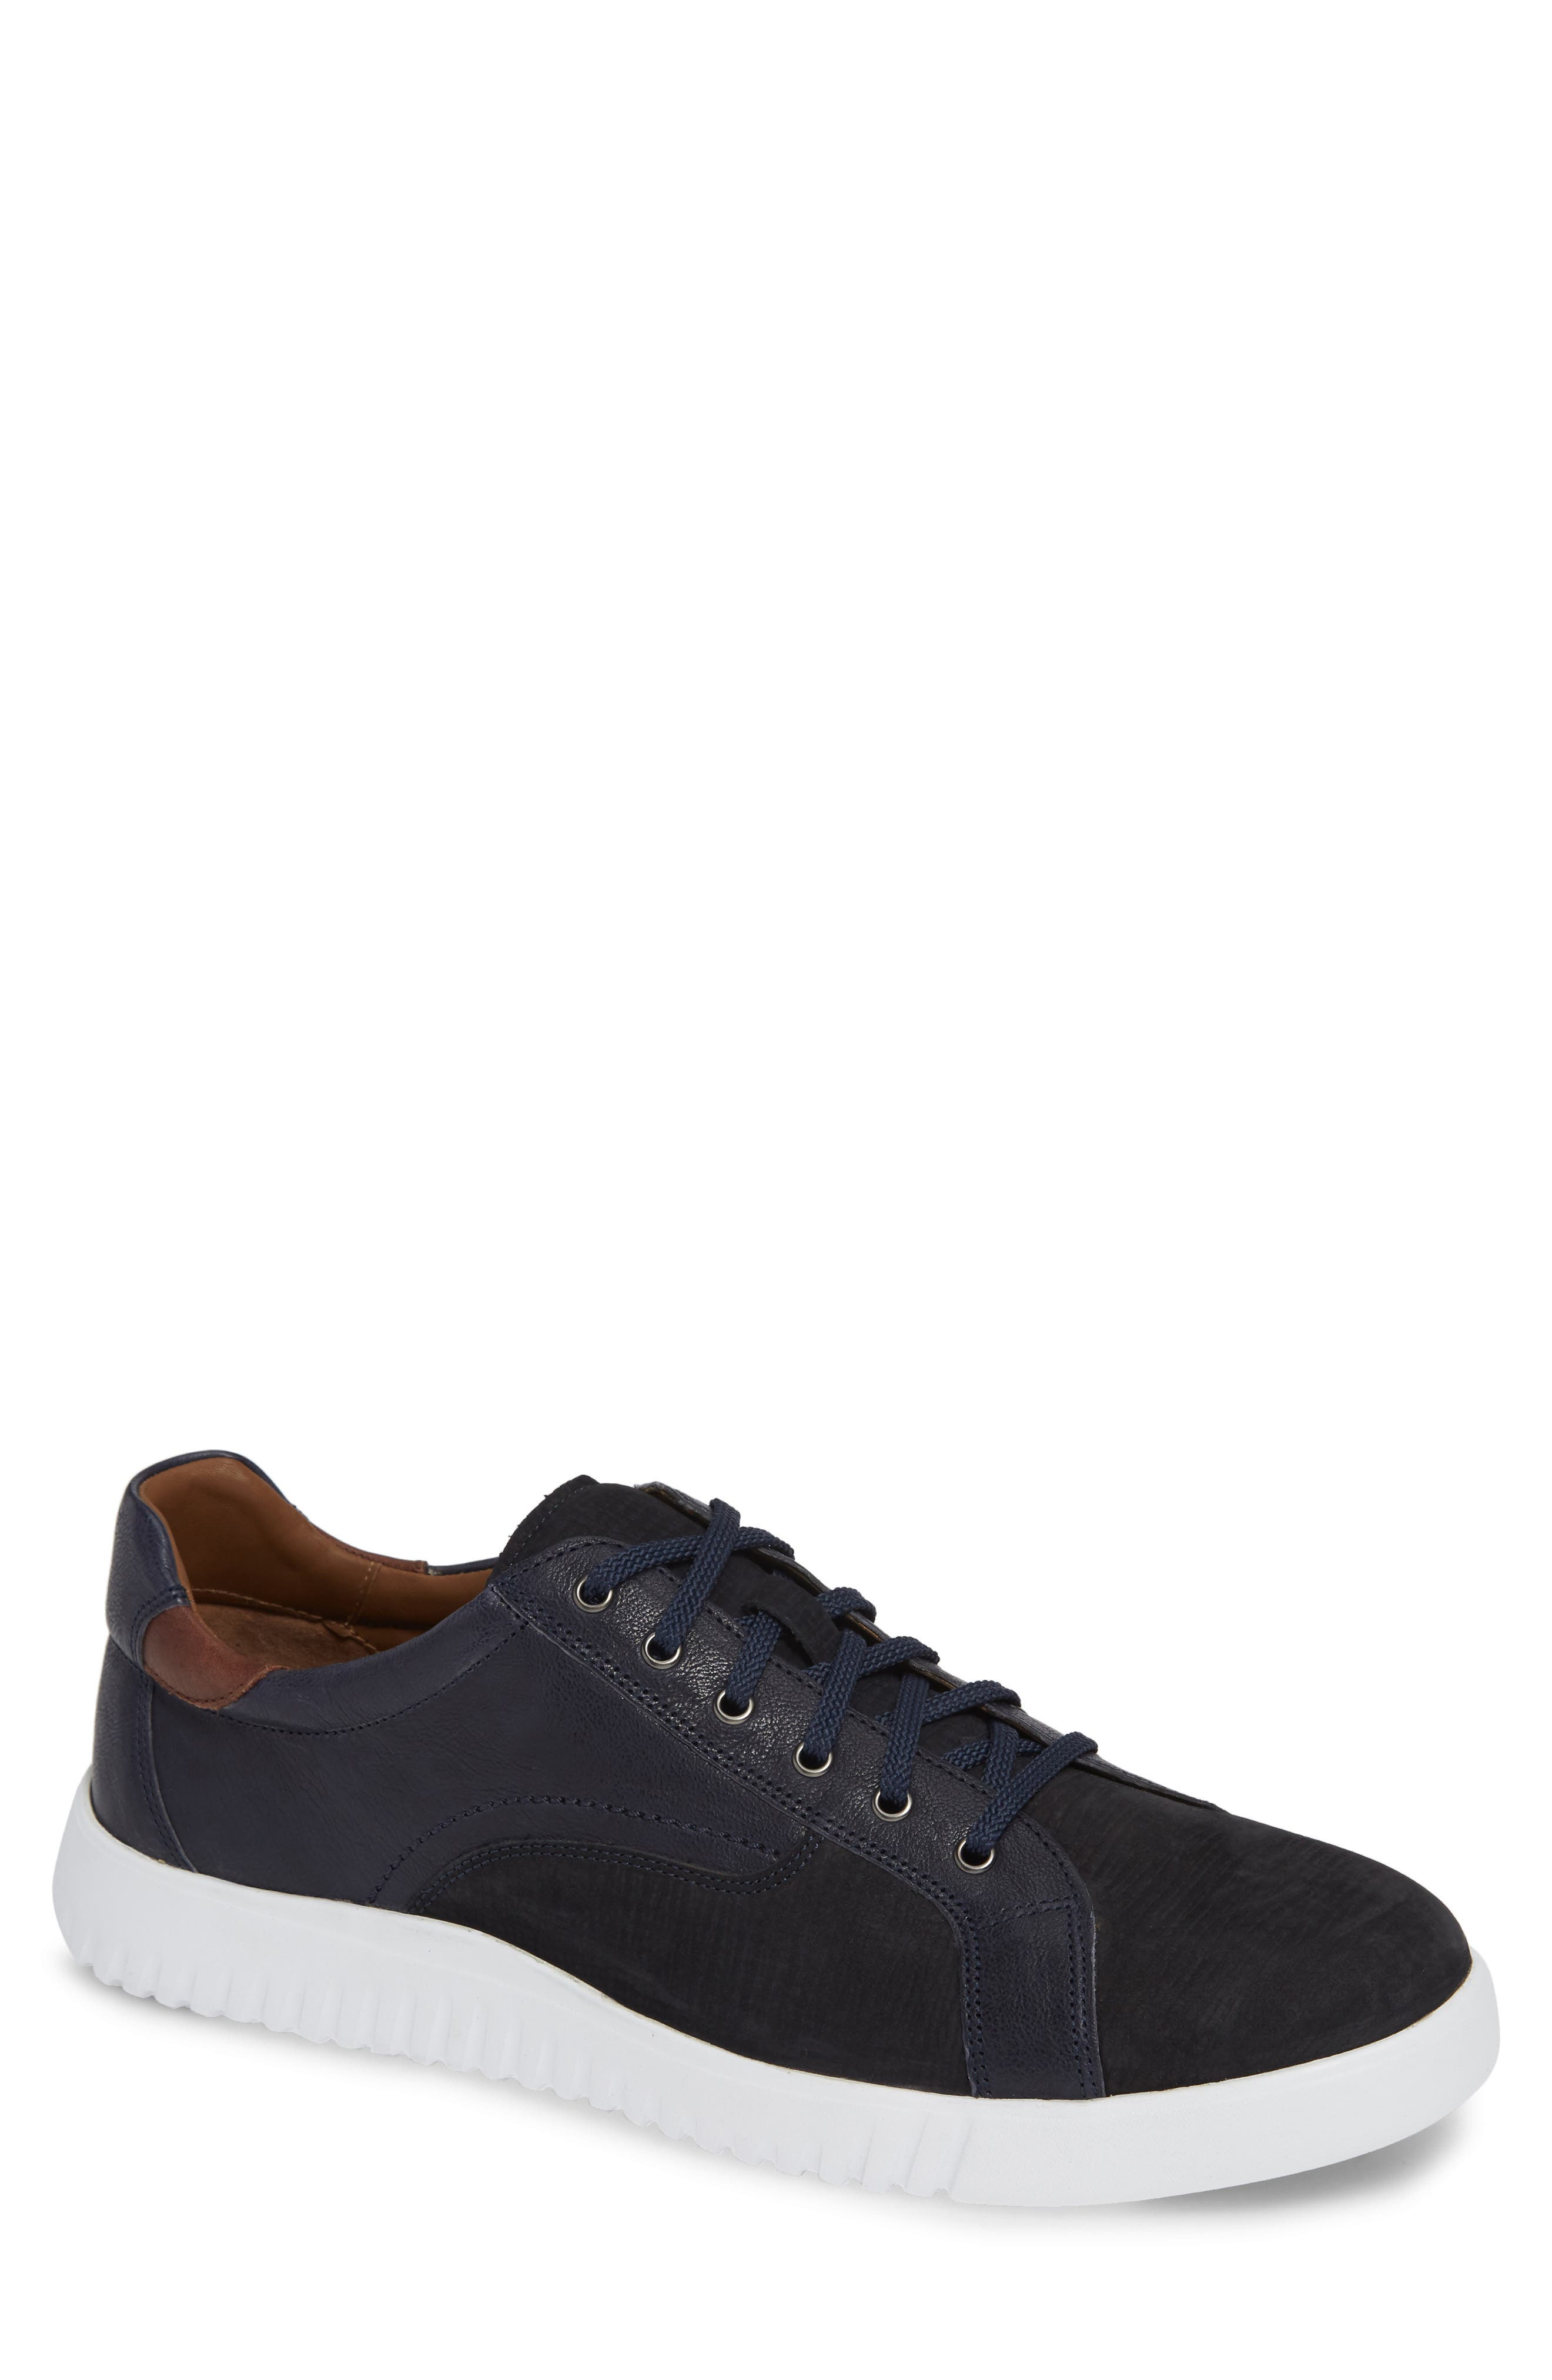 JOHNSTON & MURPHY McFarland Sneaker, Main, color, NAVY NUBUCK